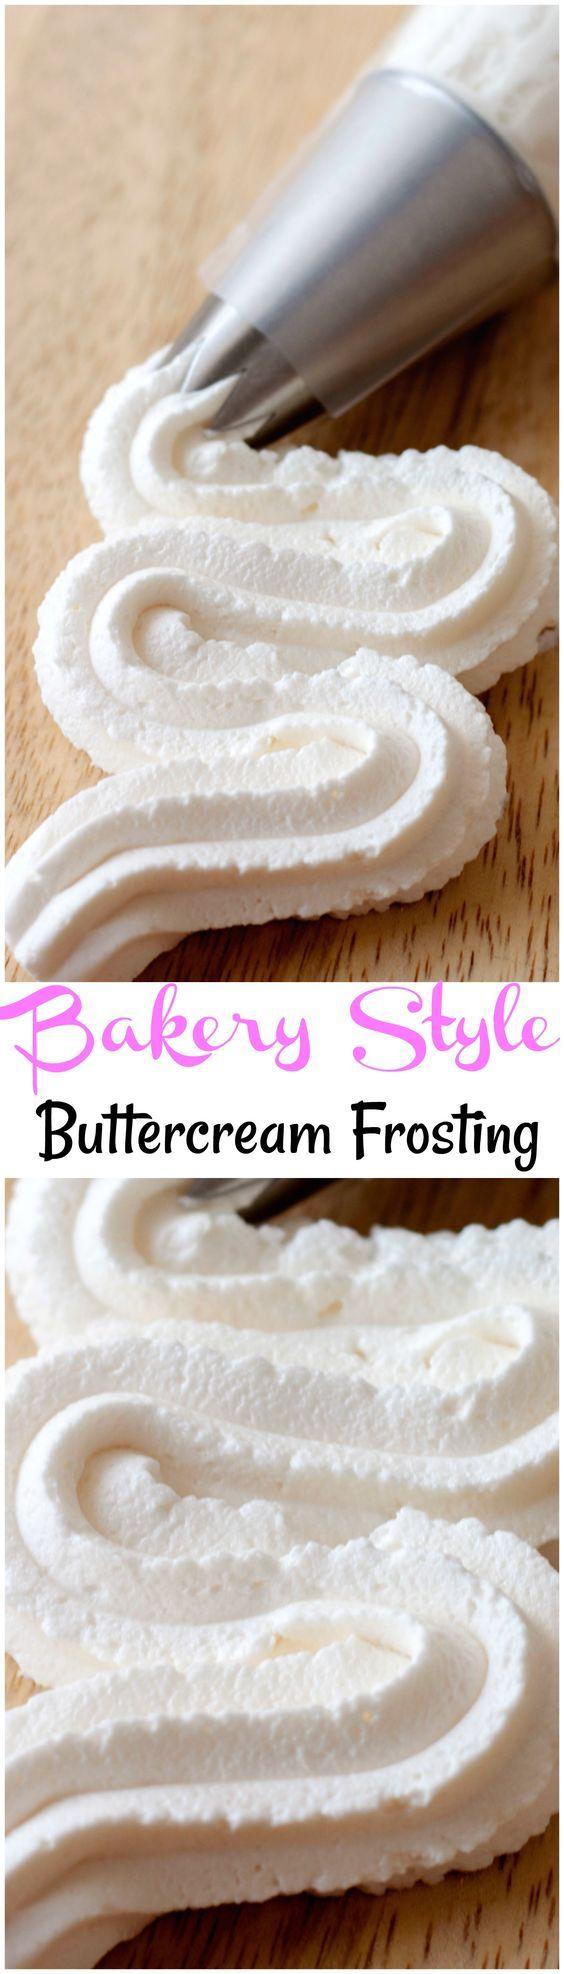 bakery style homemade buttercream frosting, homemade buttercream frosting like a bakery, homemade buttercream, best buttercream, bakery buttercream frosting